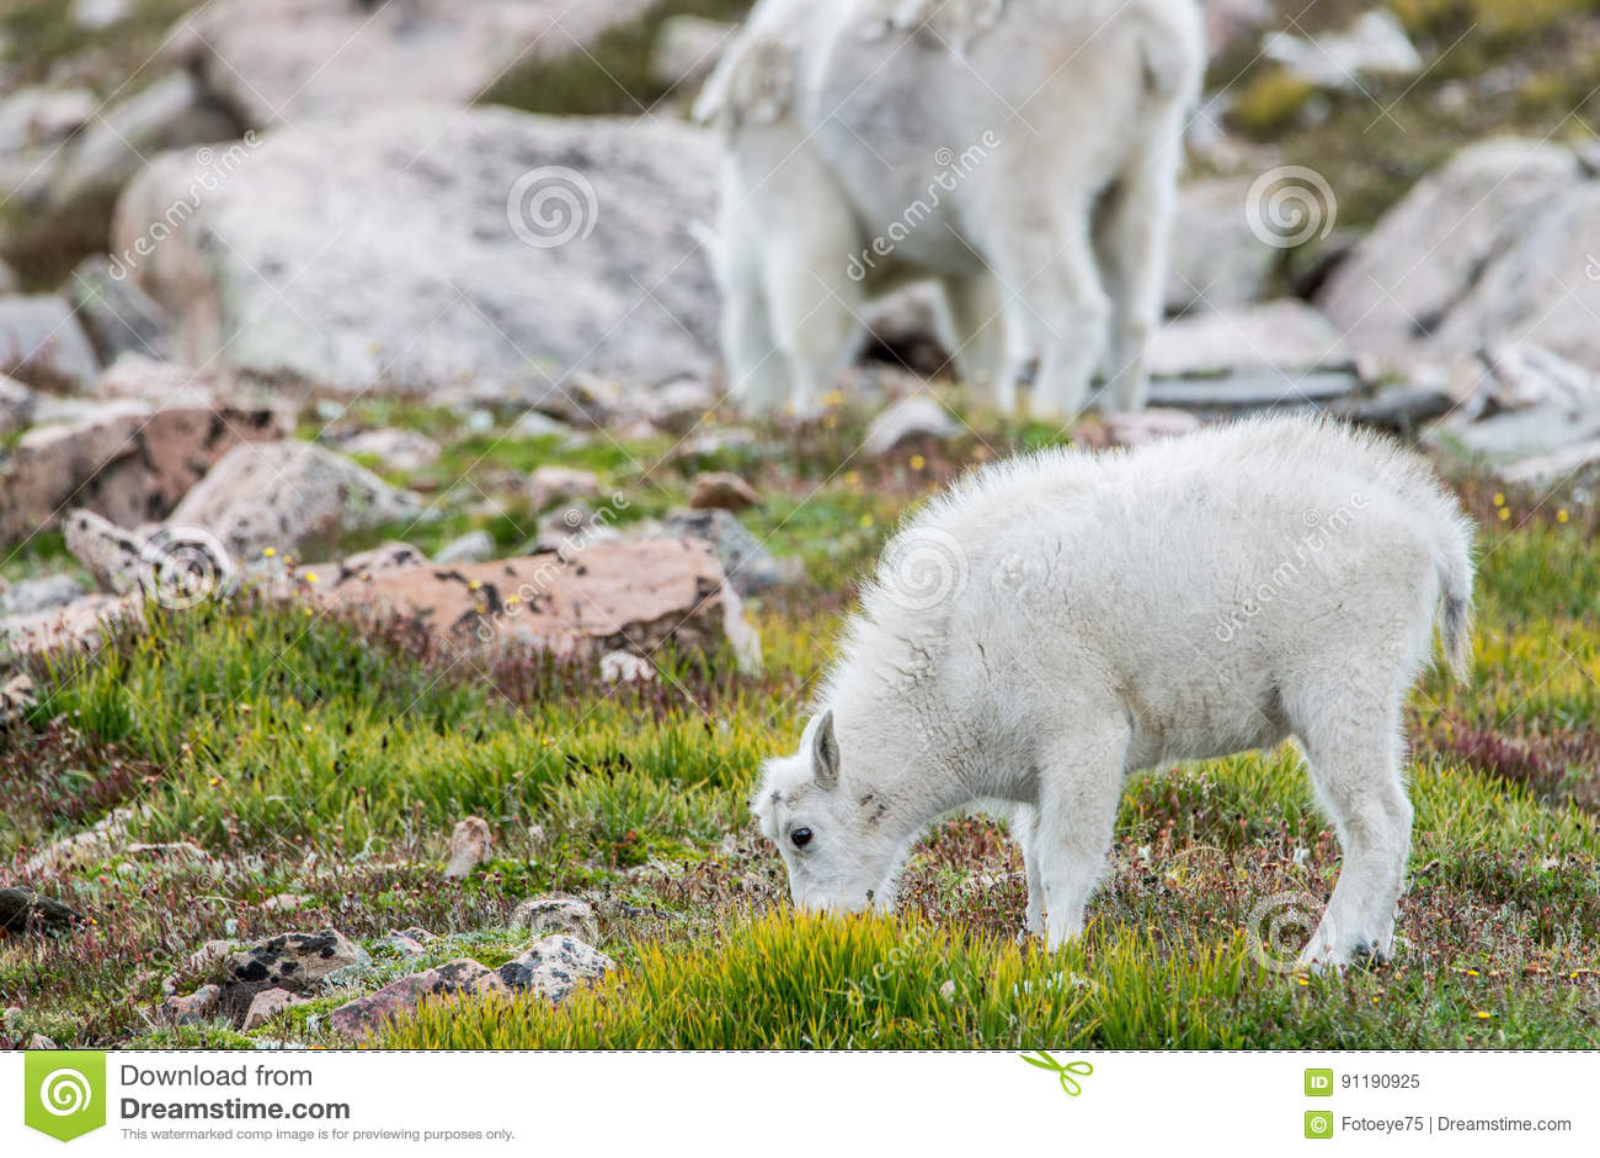 White Big Horn Sheep - Rocky Mountain Goat